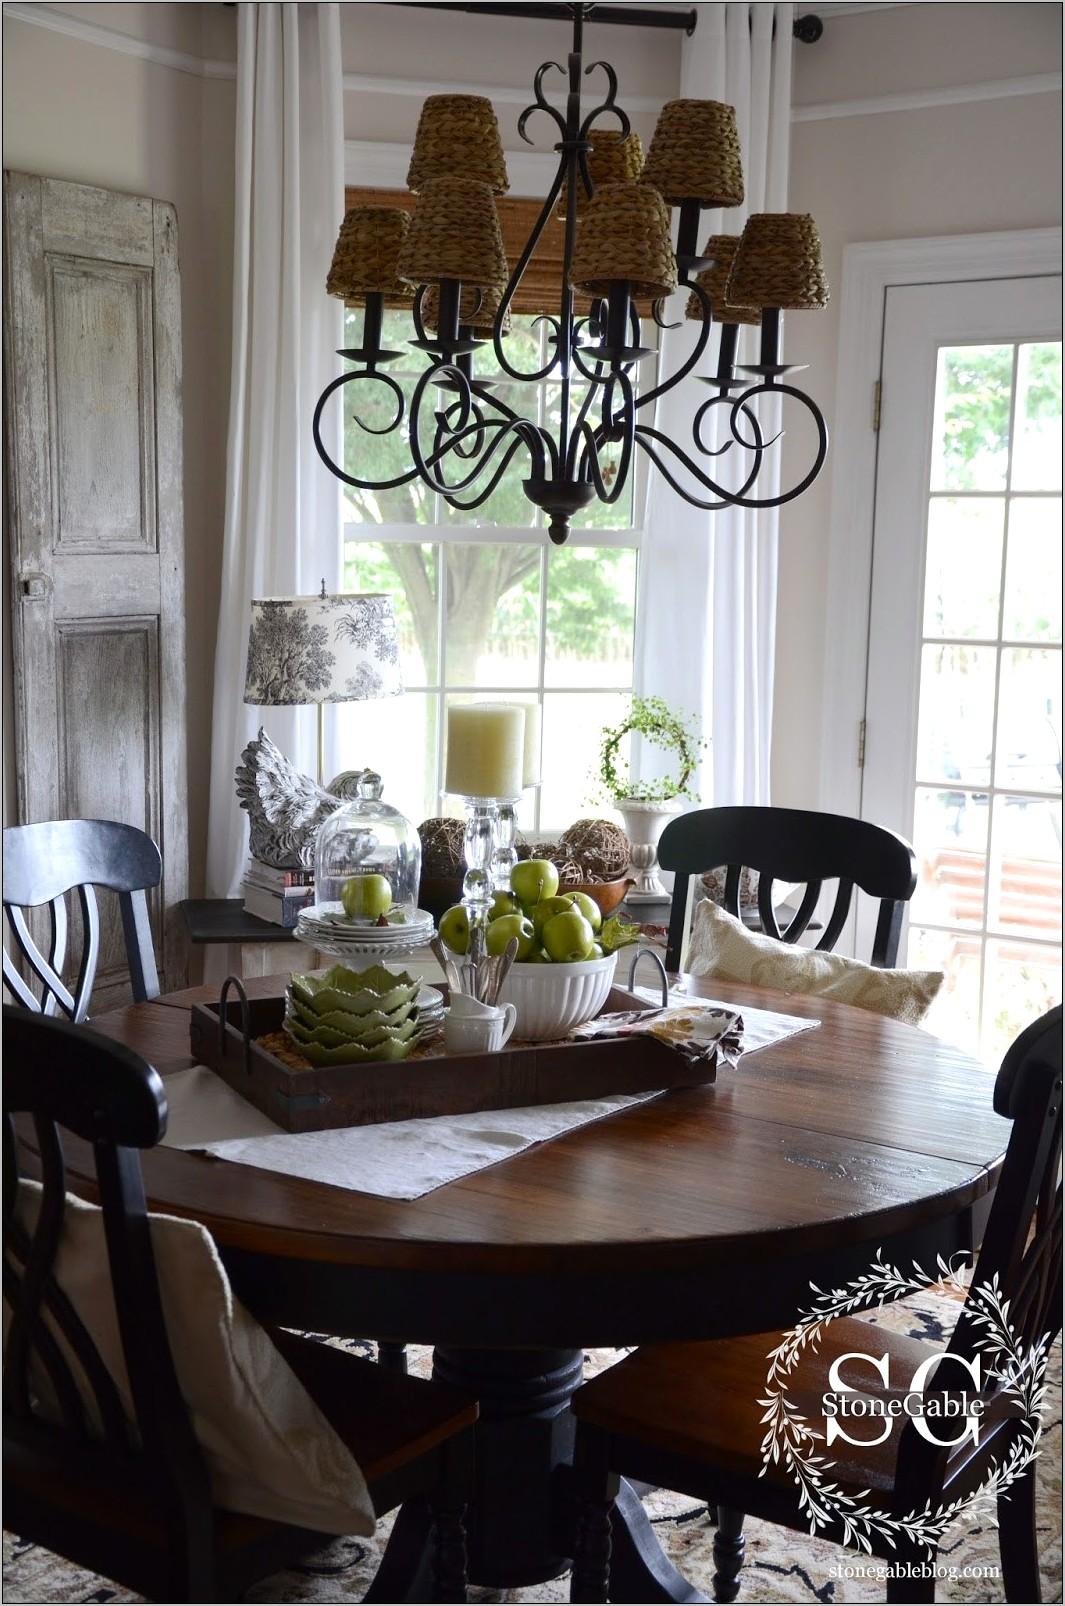 Everyday Kitchen Table Decor Ideas